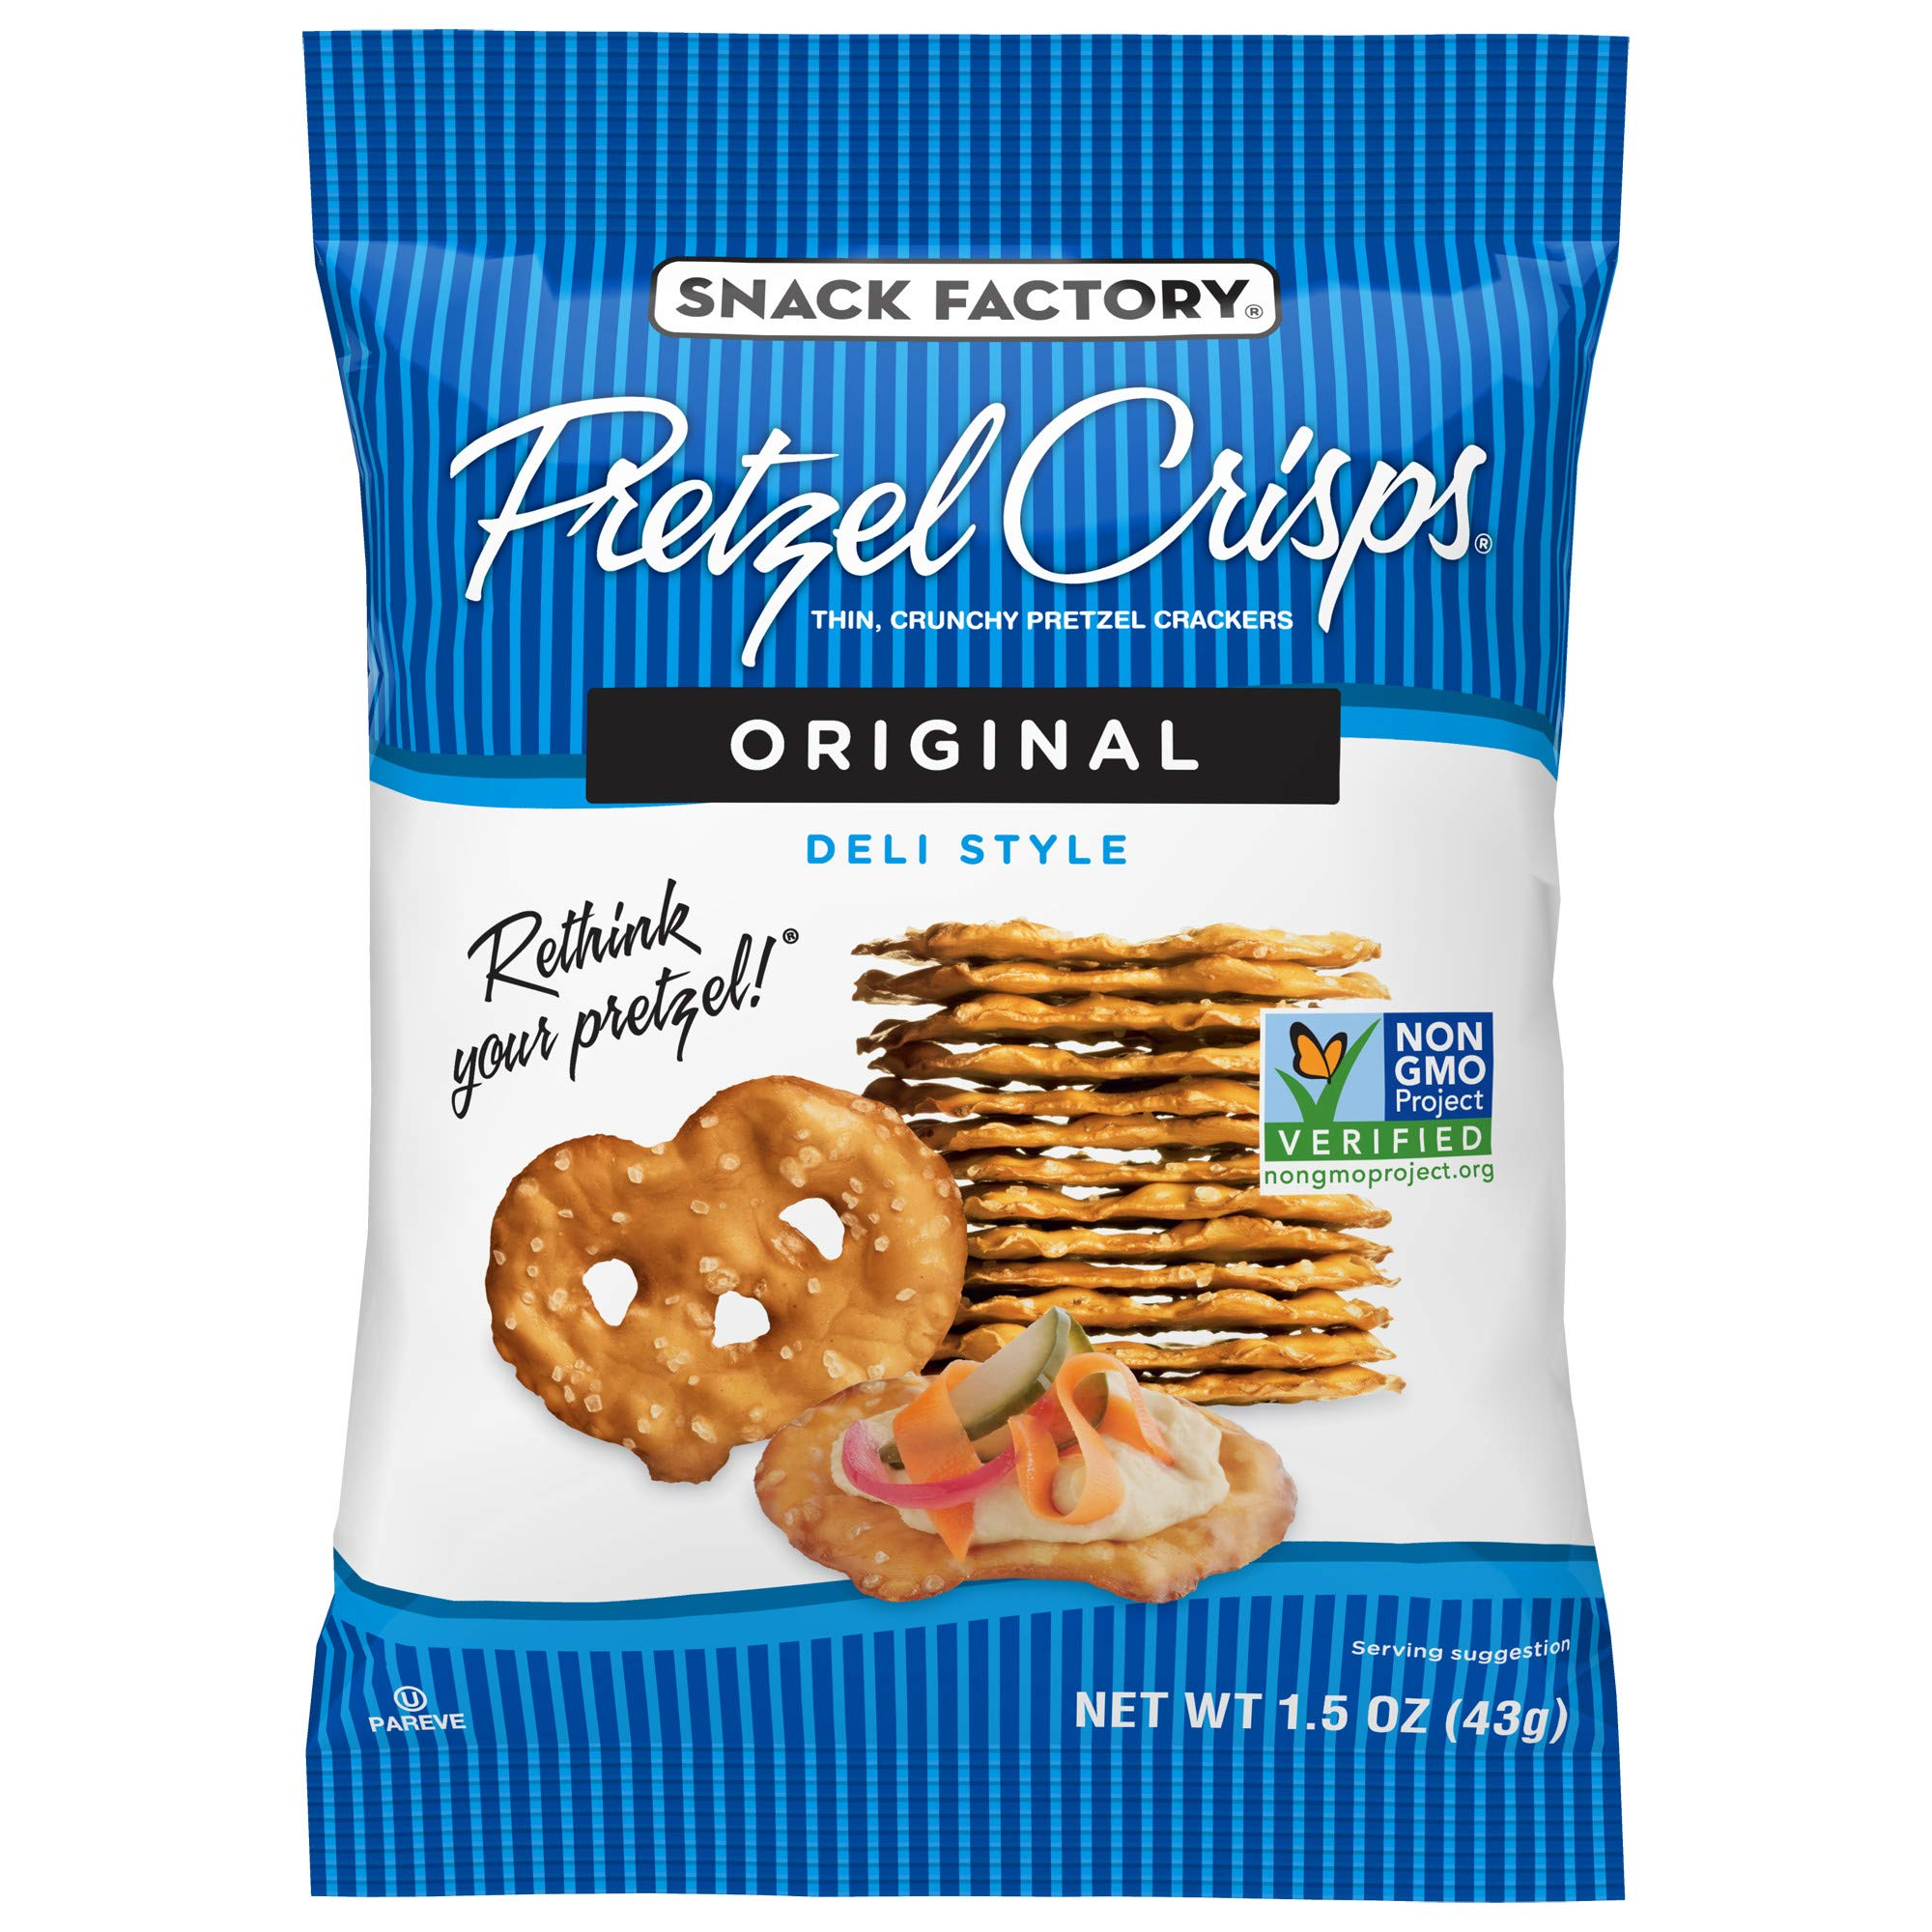 Snack Factory Pretzel Crisps, Original, Single-Serve 1.5 Ounce (Pack of 24) by Snack Factory